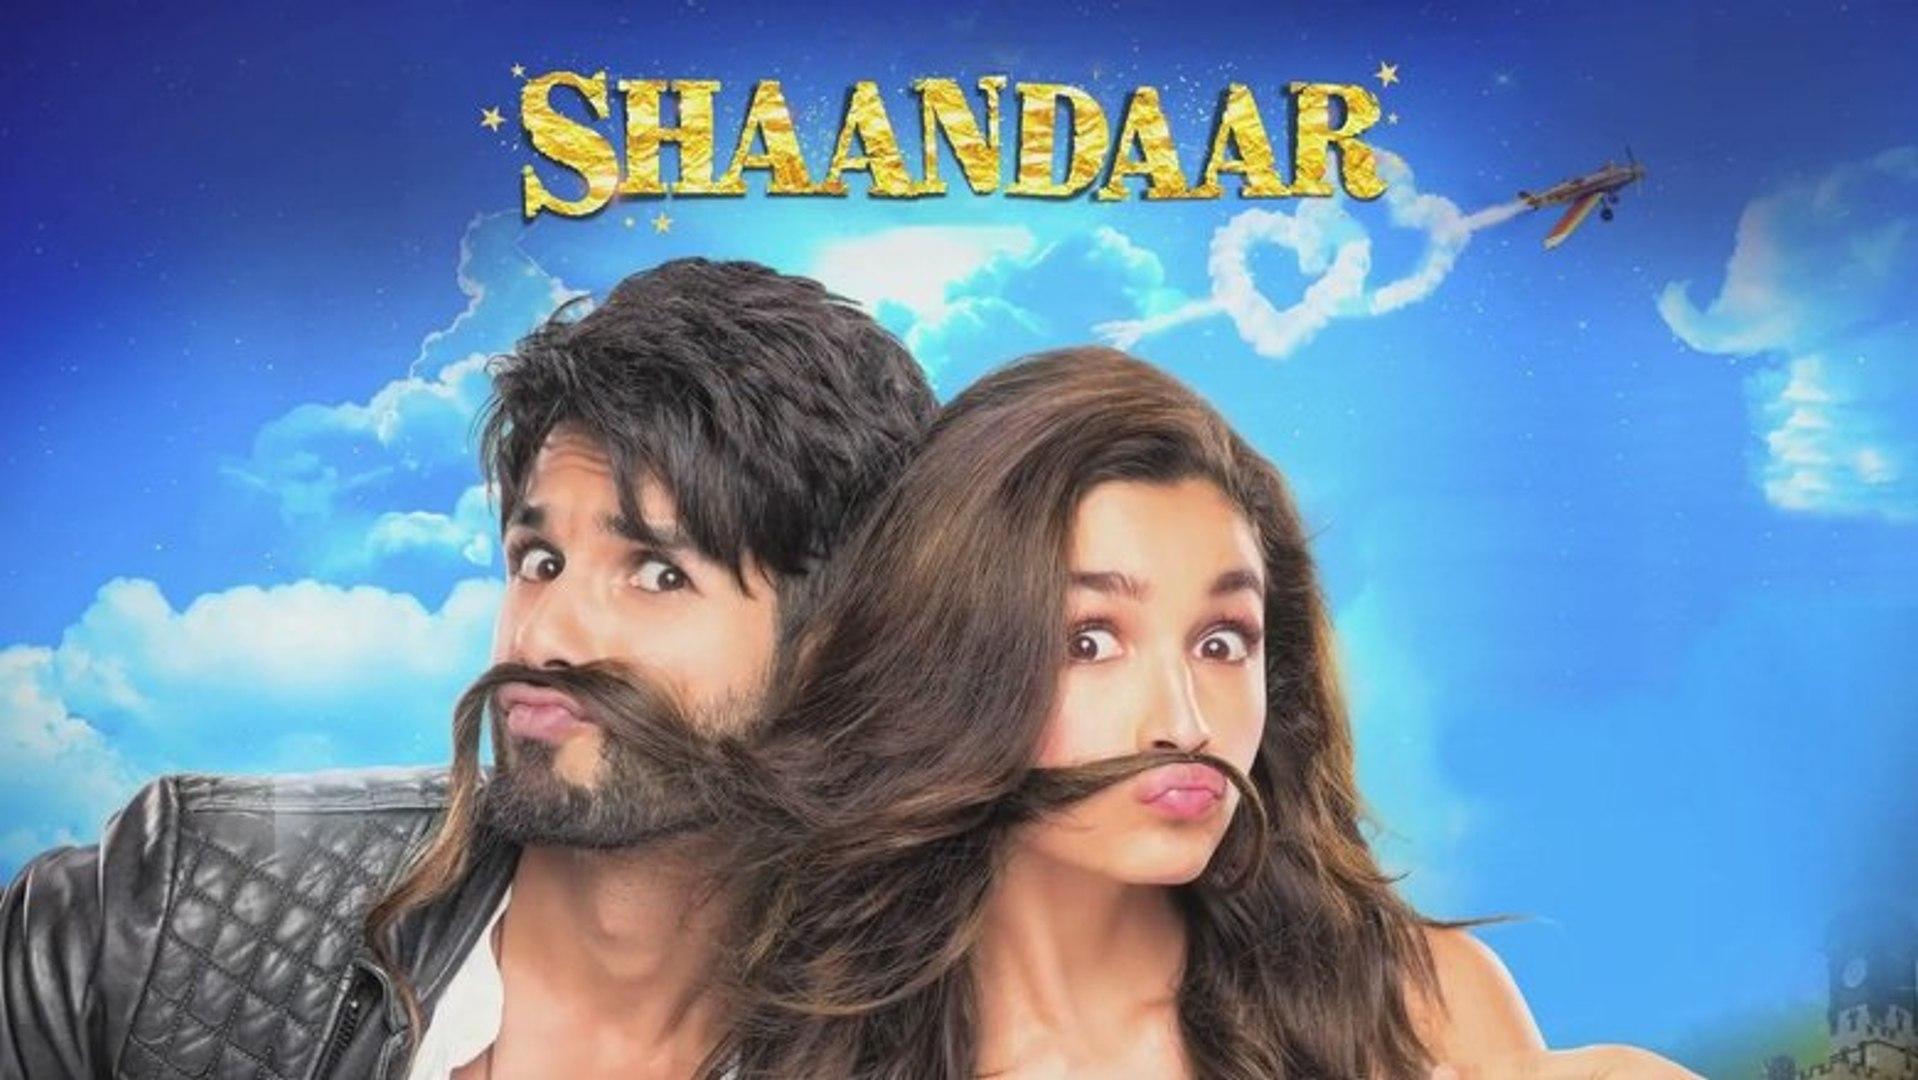 watch shaandaar online free with english subtitles